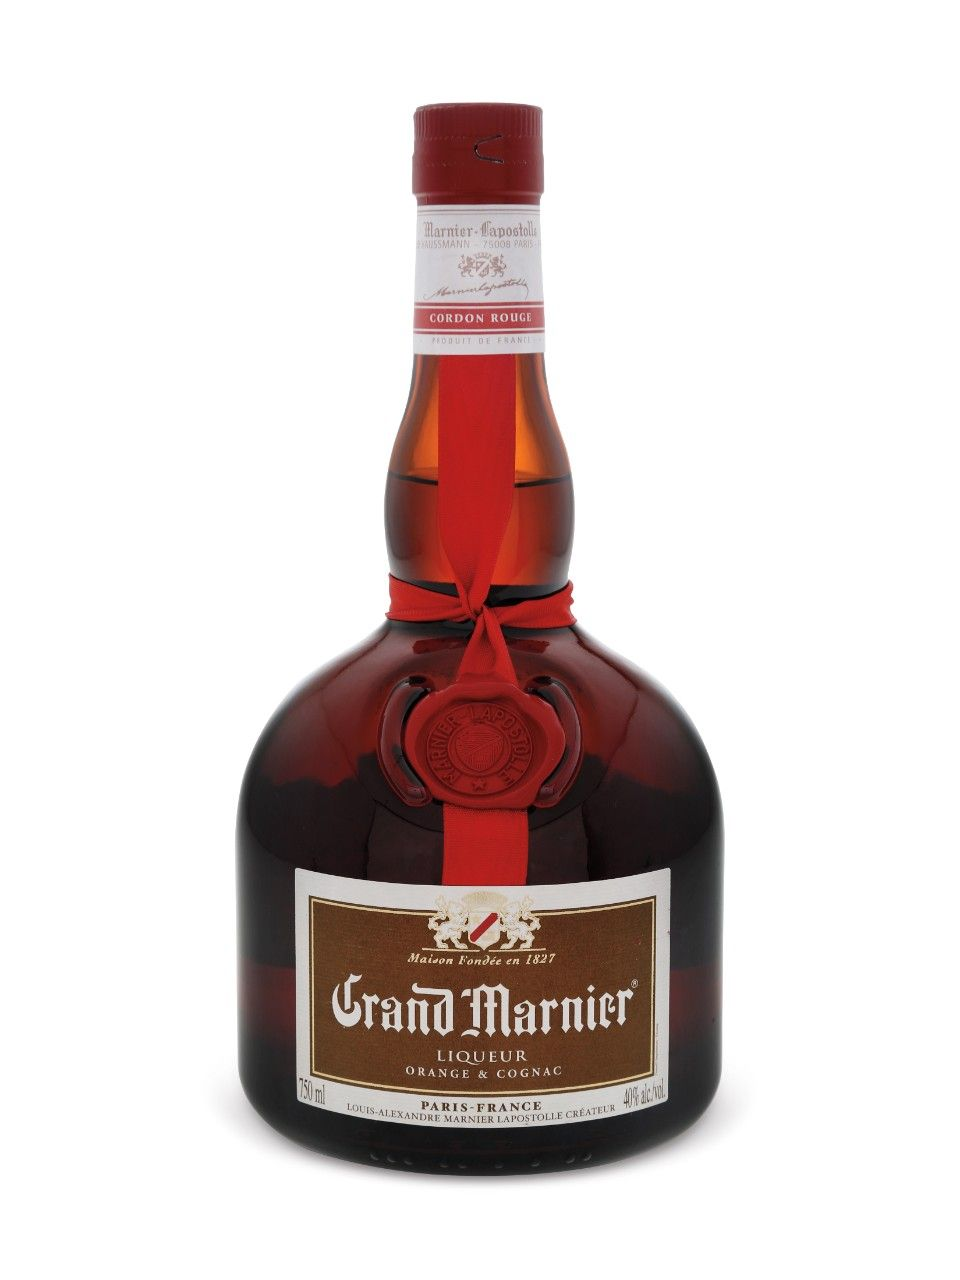 Grand Marnier Grand Marnier Liqueur Liquor List